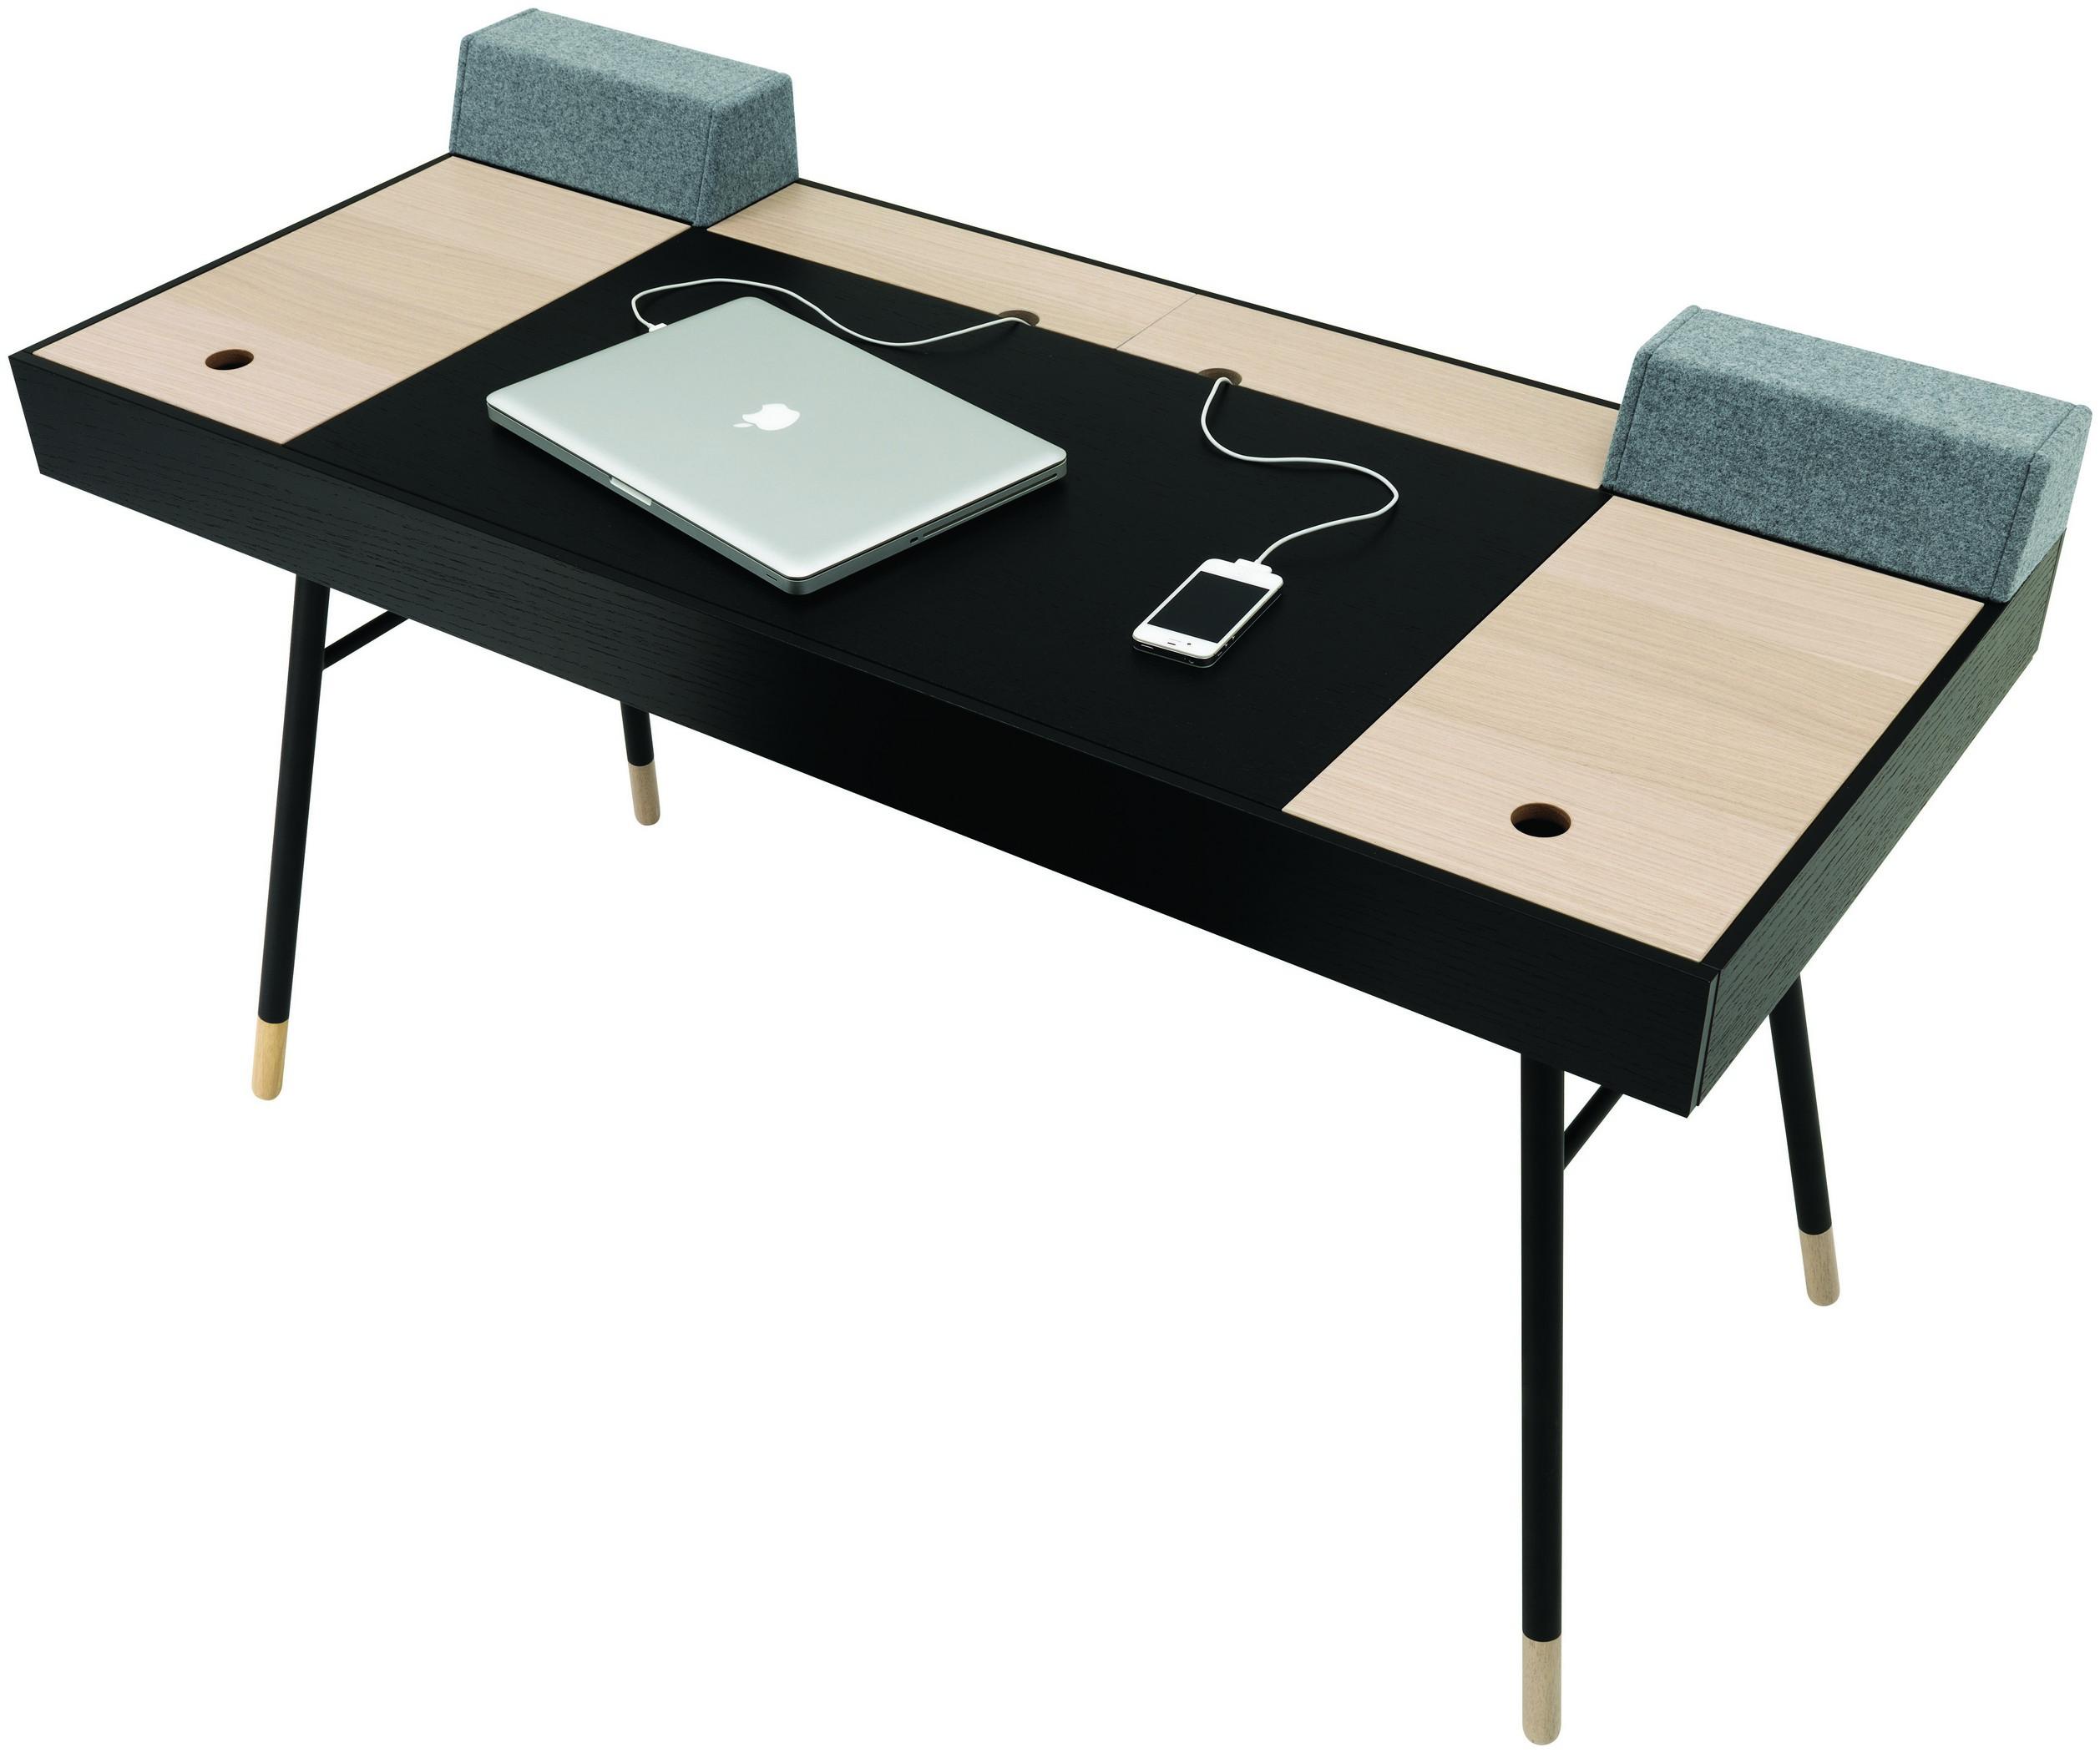 Cupertino Desk By Boconcept A S Media Slideshow 1